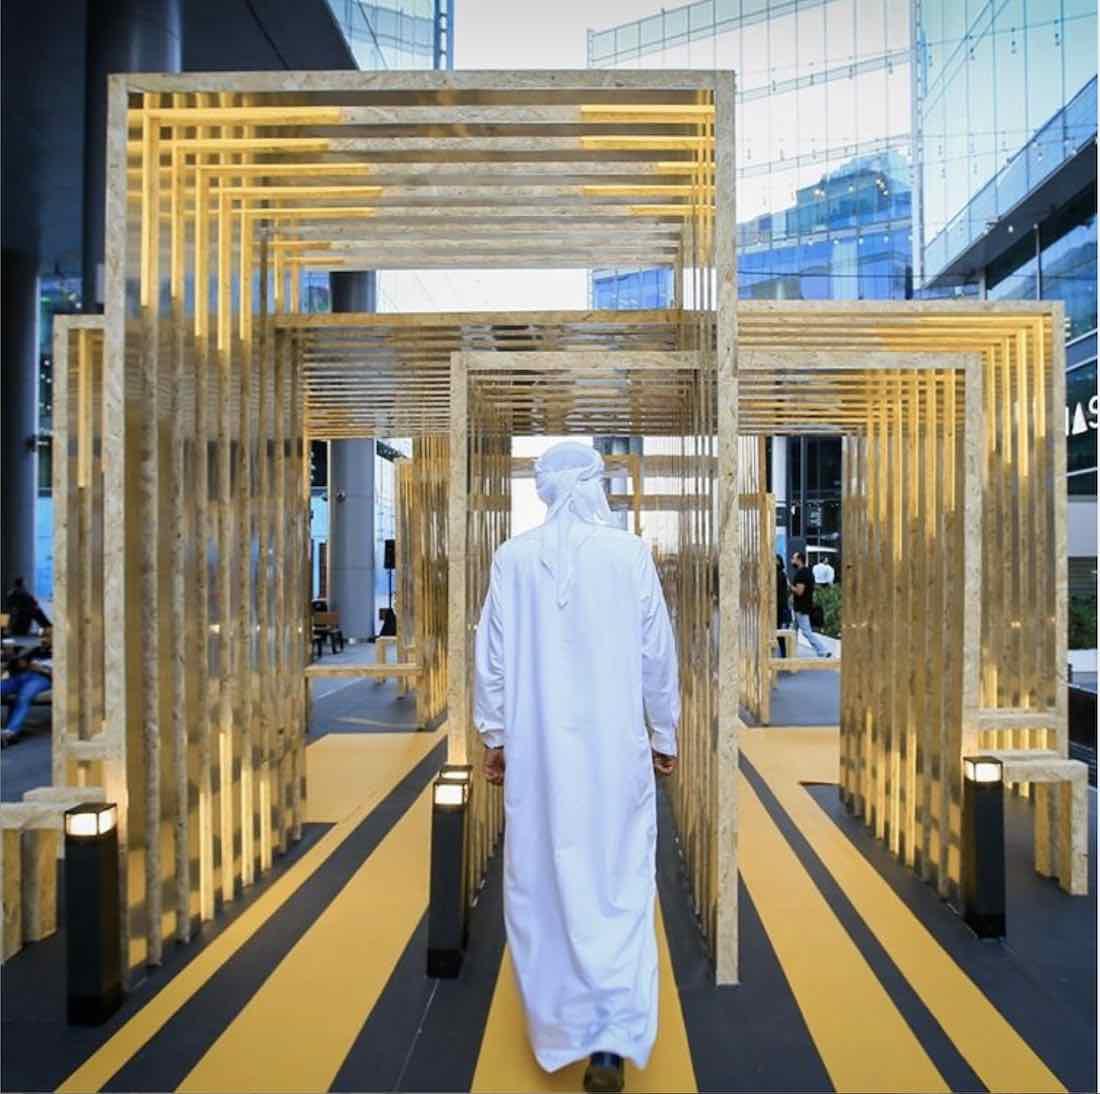 DubaiDesignWeek2020. Deterministic Path Exhibition - Photo via IG by @dubaidesignweek